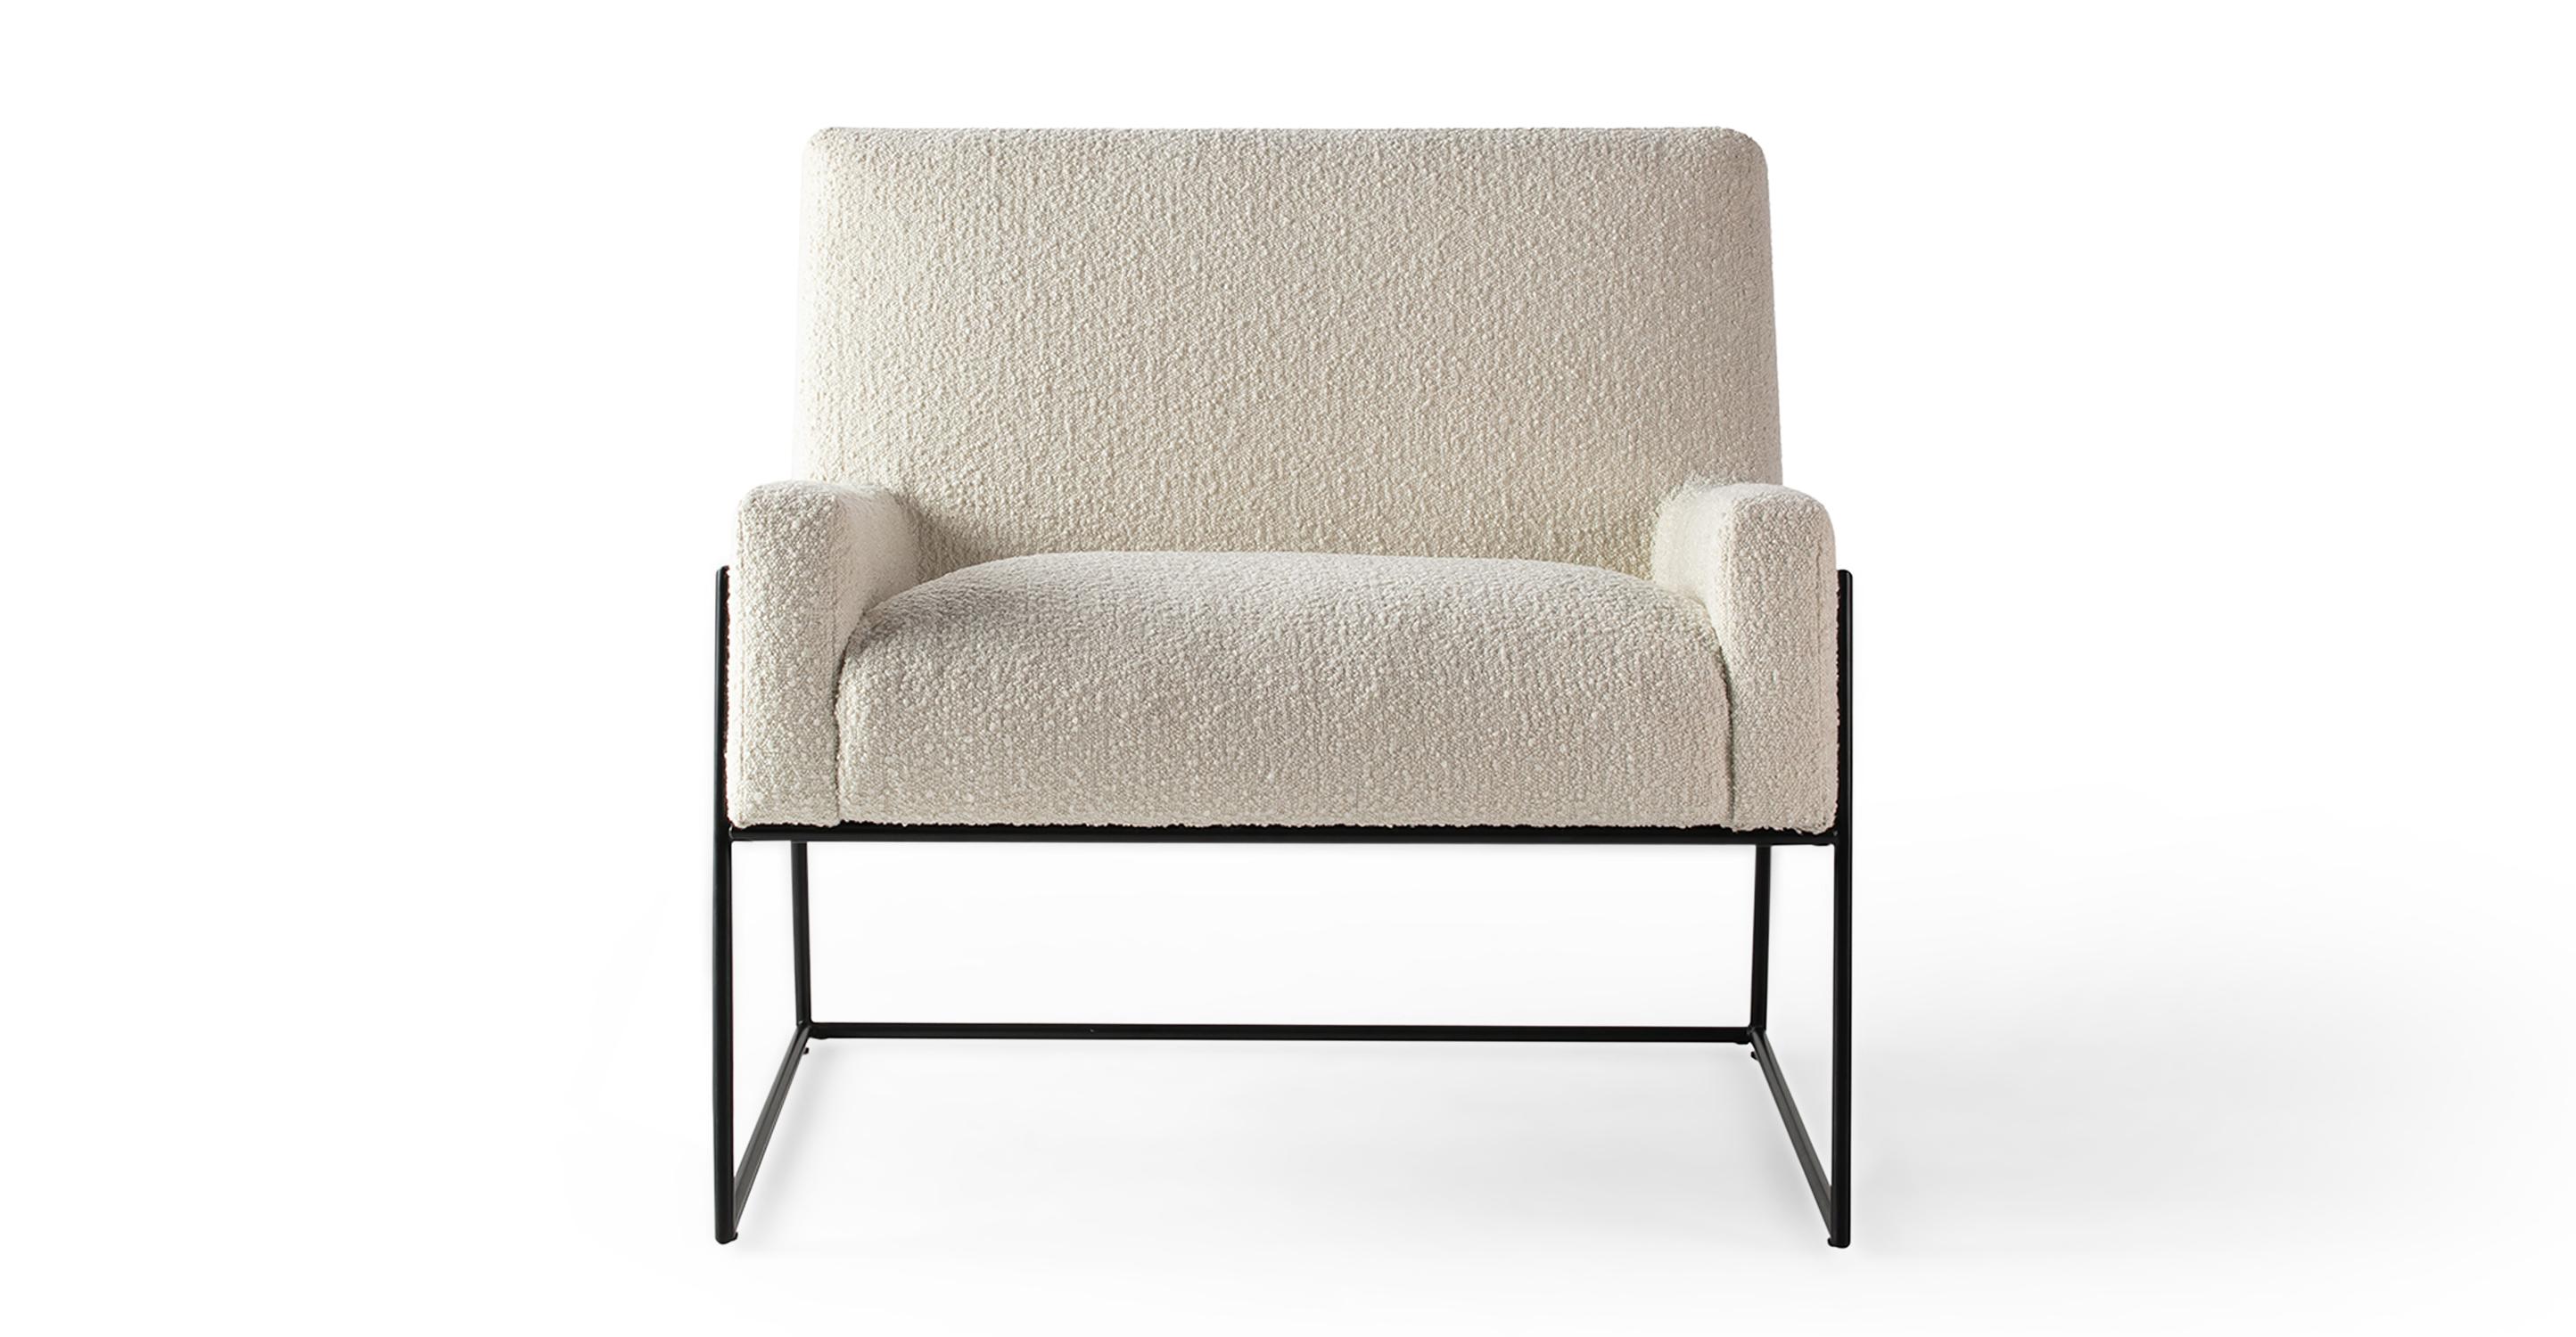 "Suspend 30"" Fabric Chair, Cream Boucle"